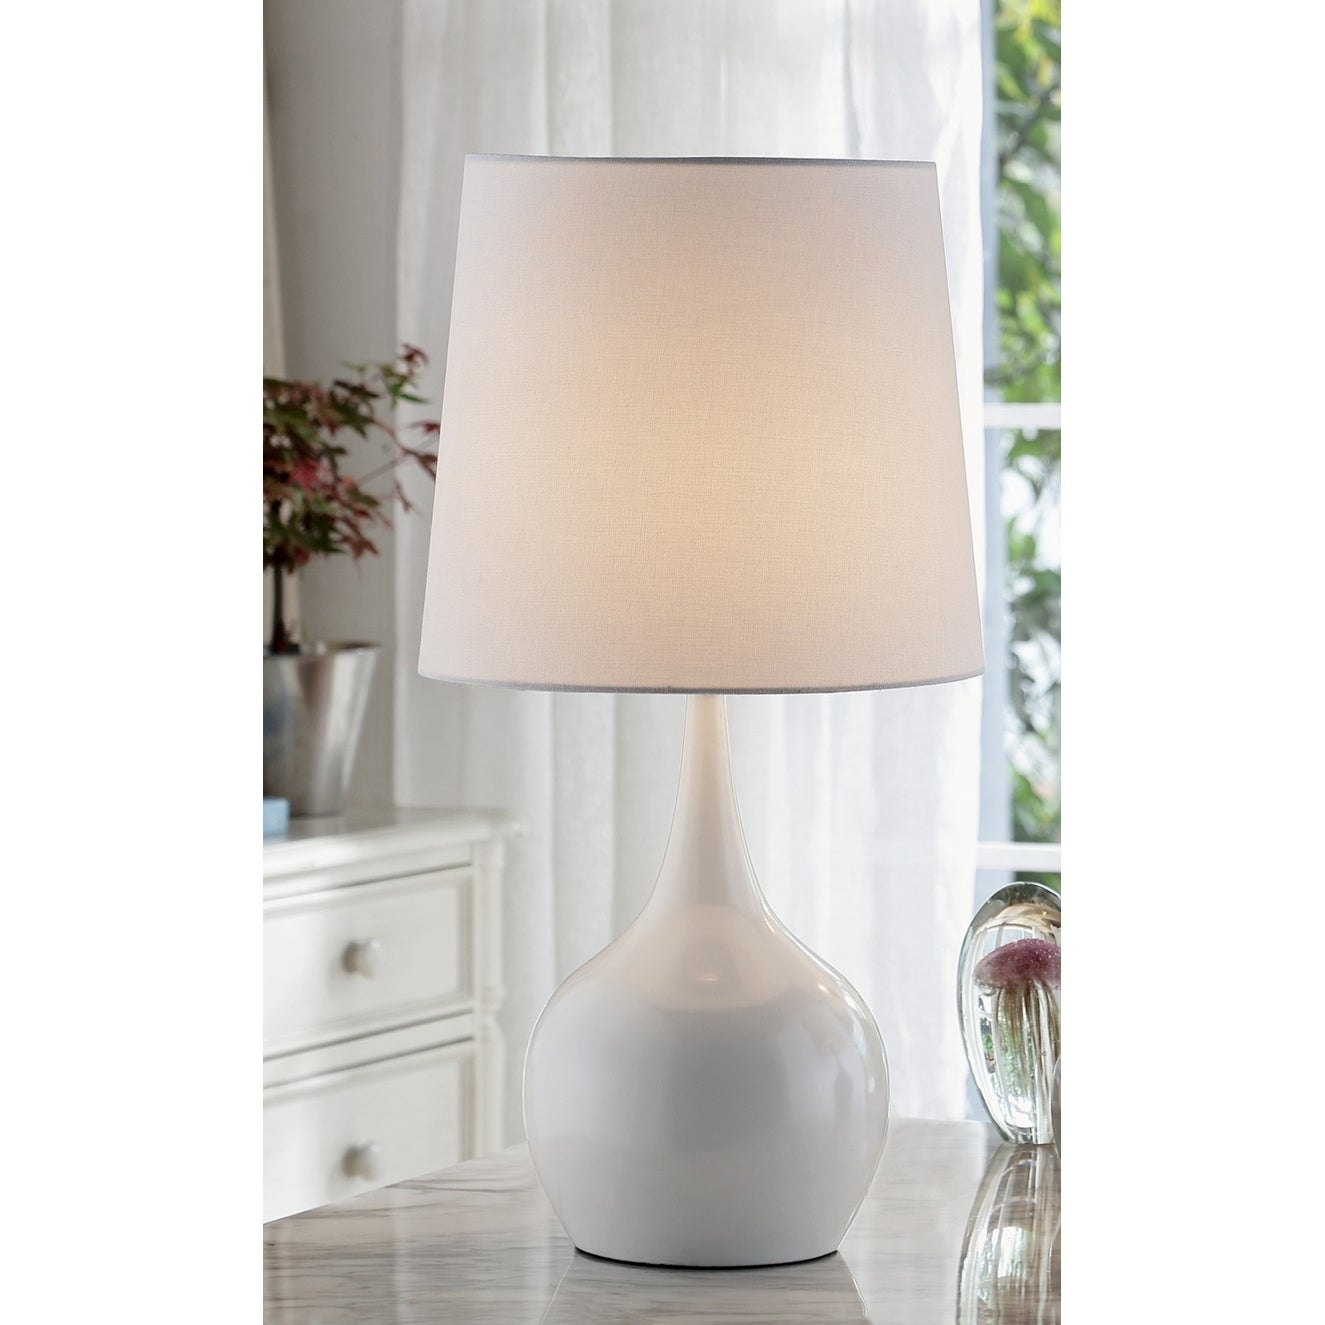 Shop Niyor Mid Century Modern Touch Metal Table Lamp On Sale